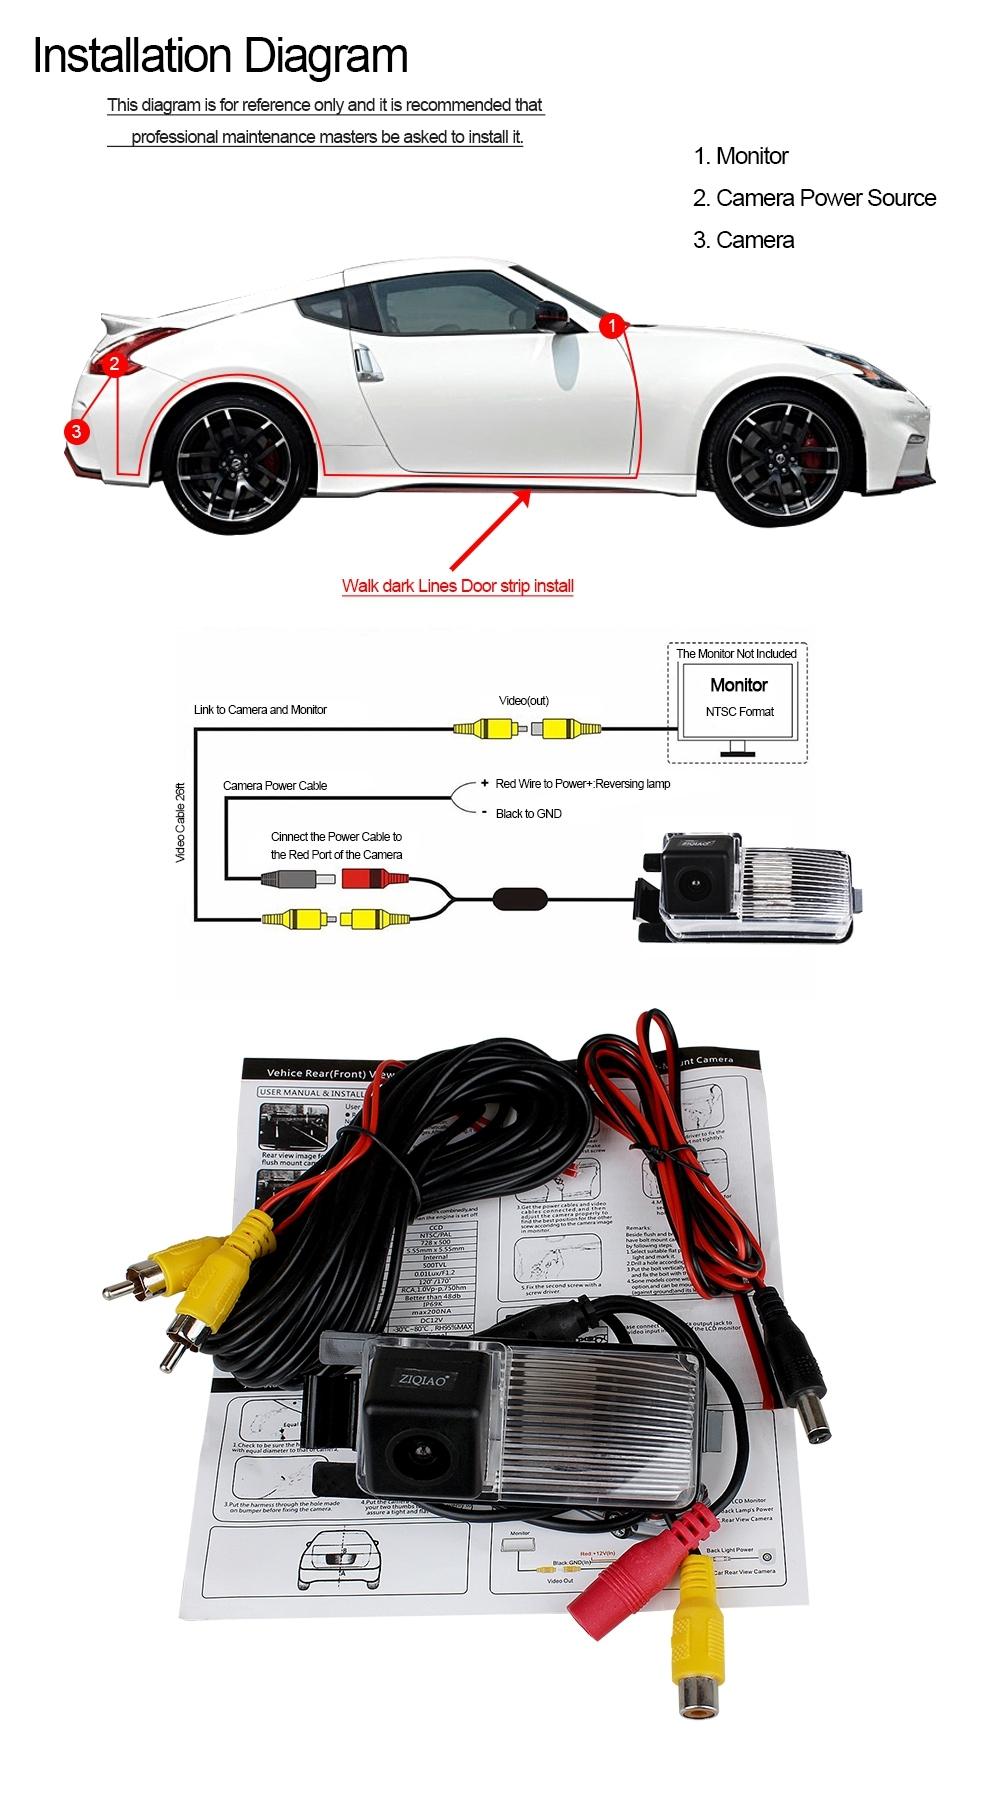 EZ_6087] Nissan 350Z Monitor Wiring Diagram Free DiagramGetap Xempag Mohammedshrine Librar Wiring 101